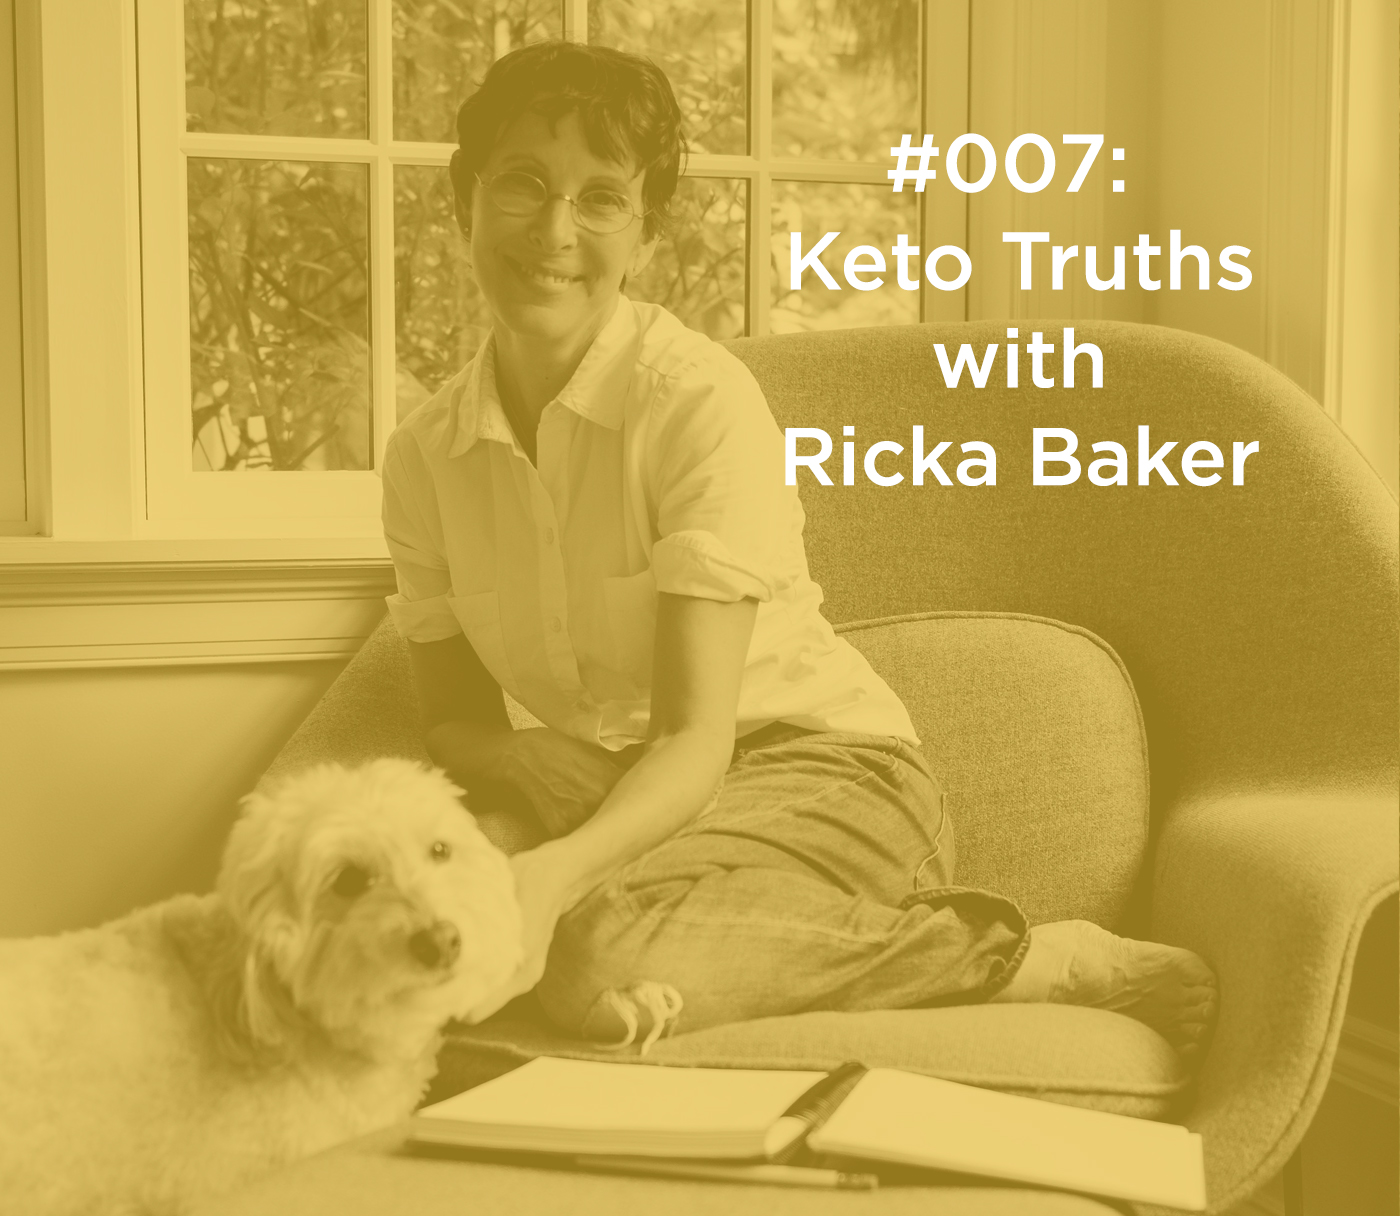 Keto Truths with Ricka Baker